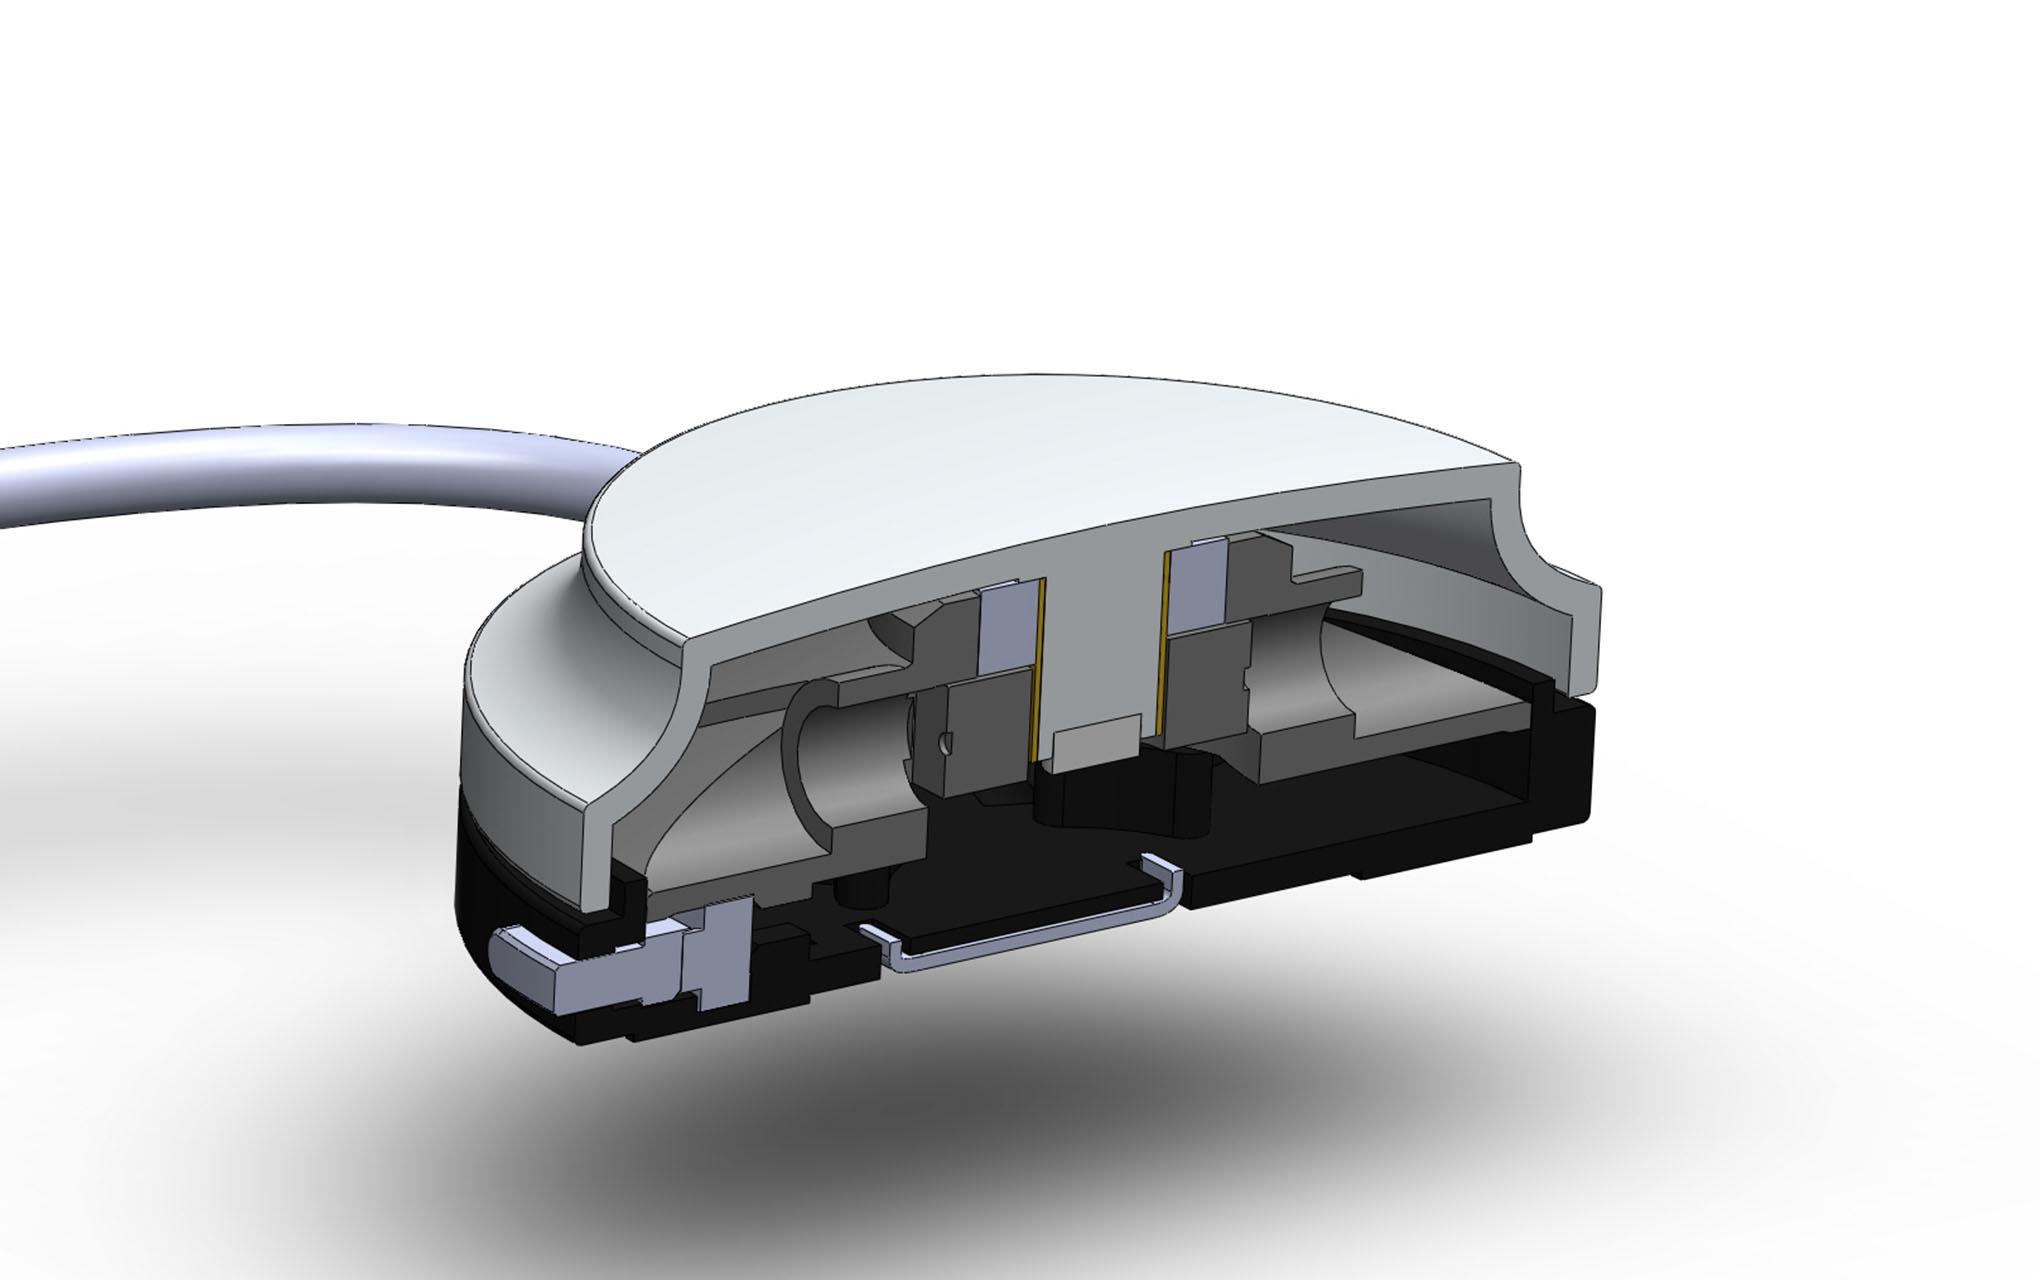 cursorcat-schnitt-prototyp